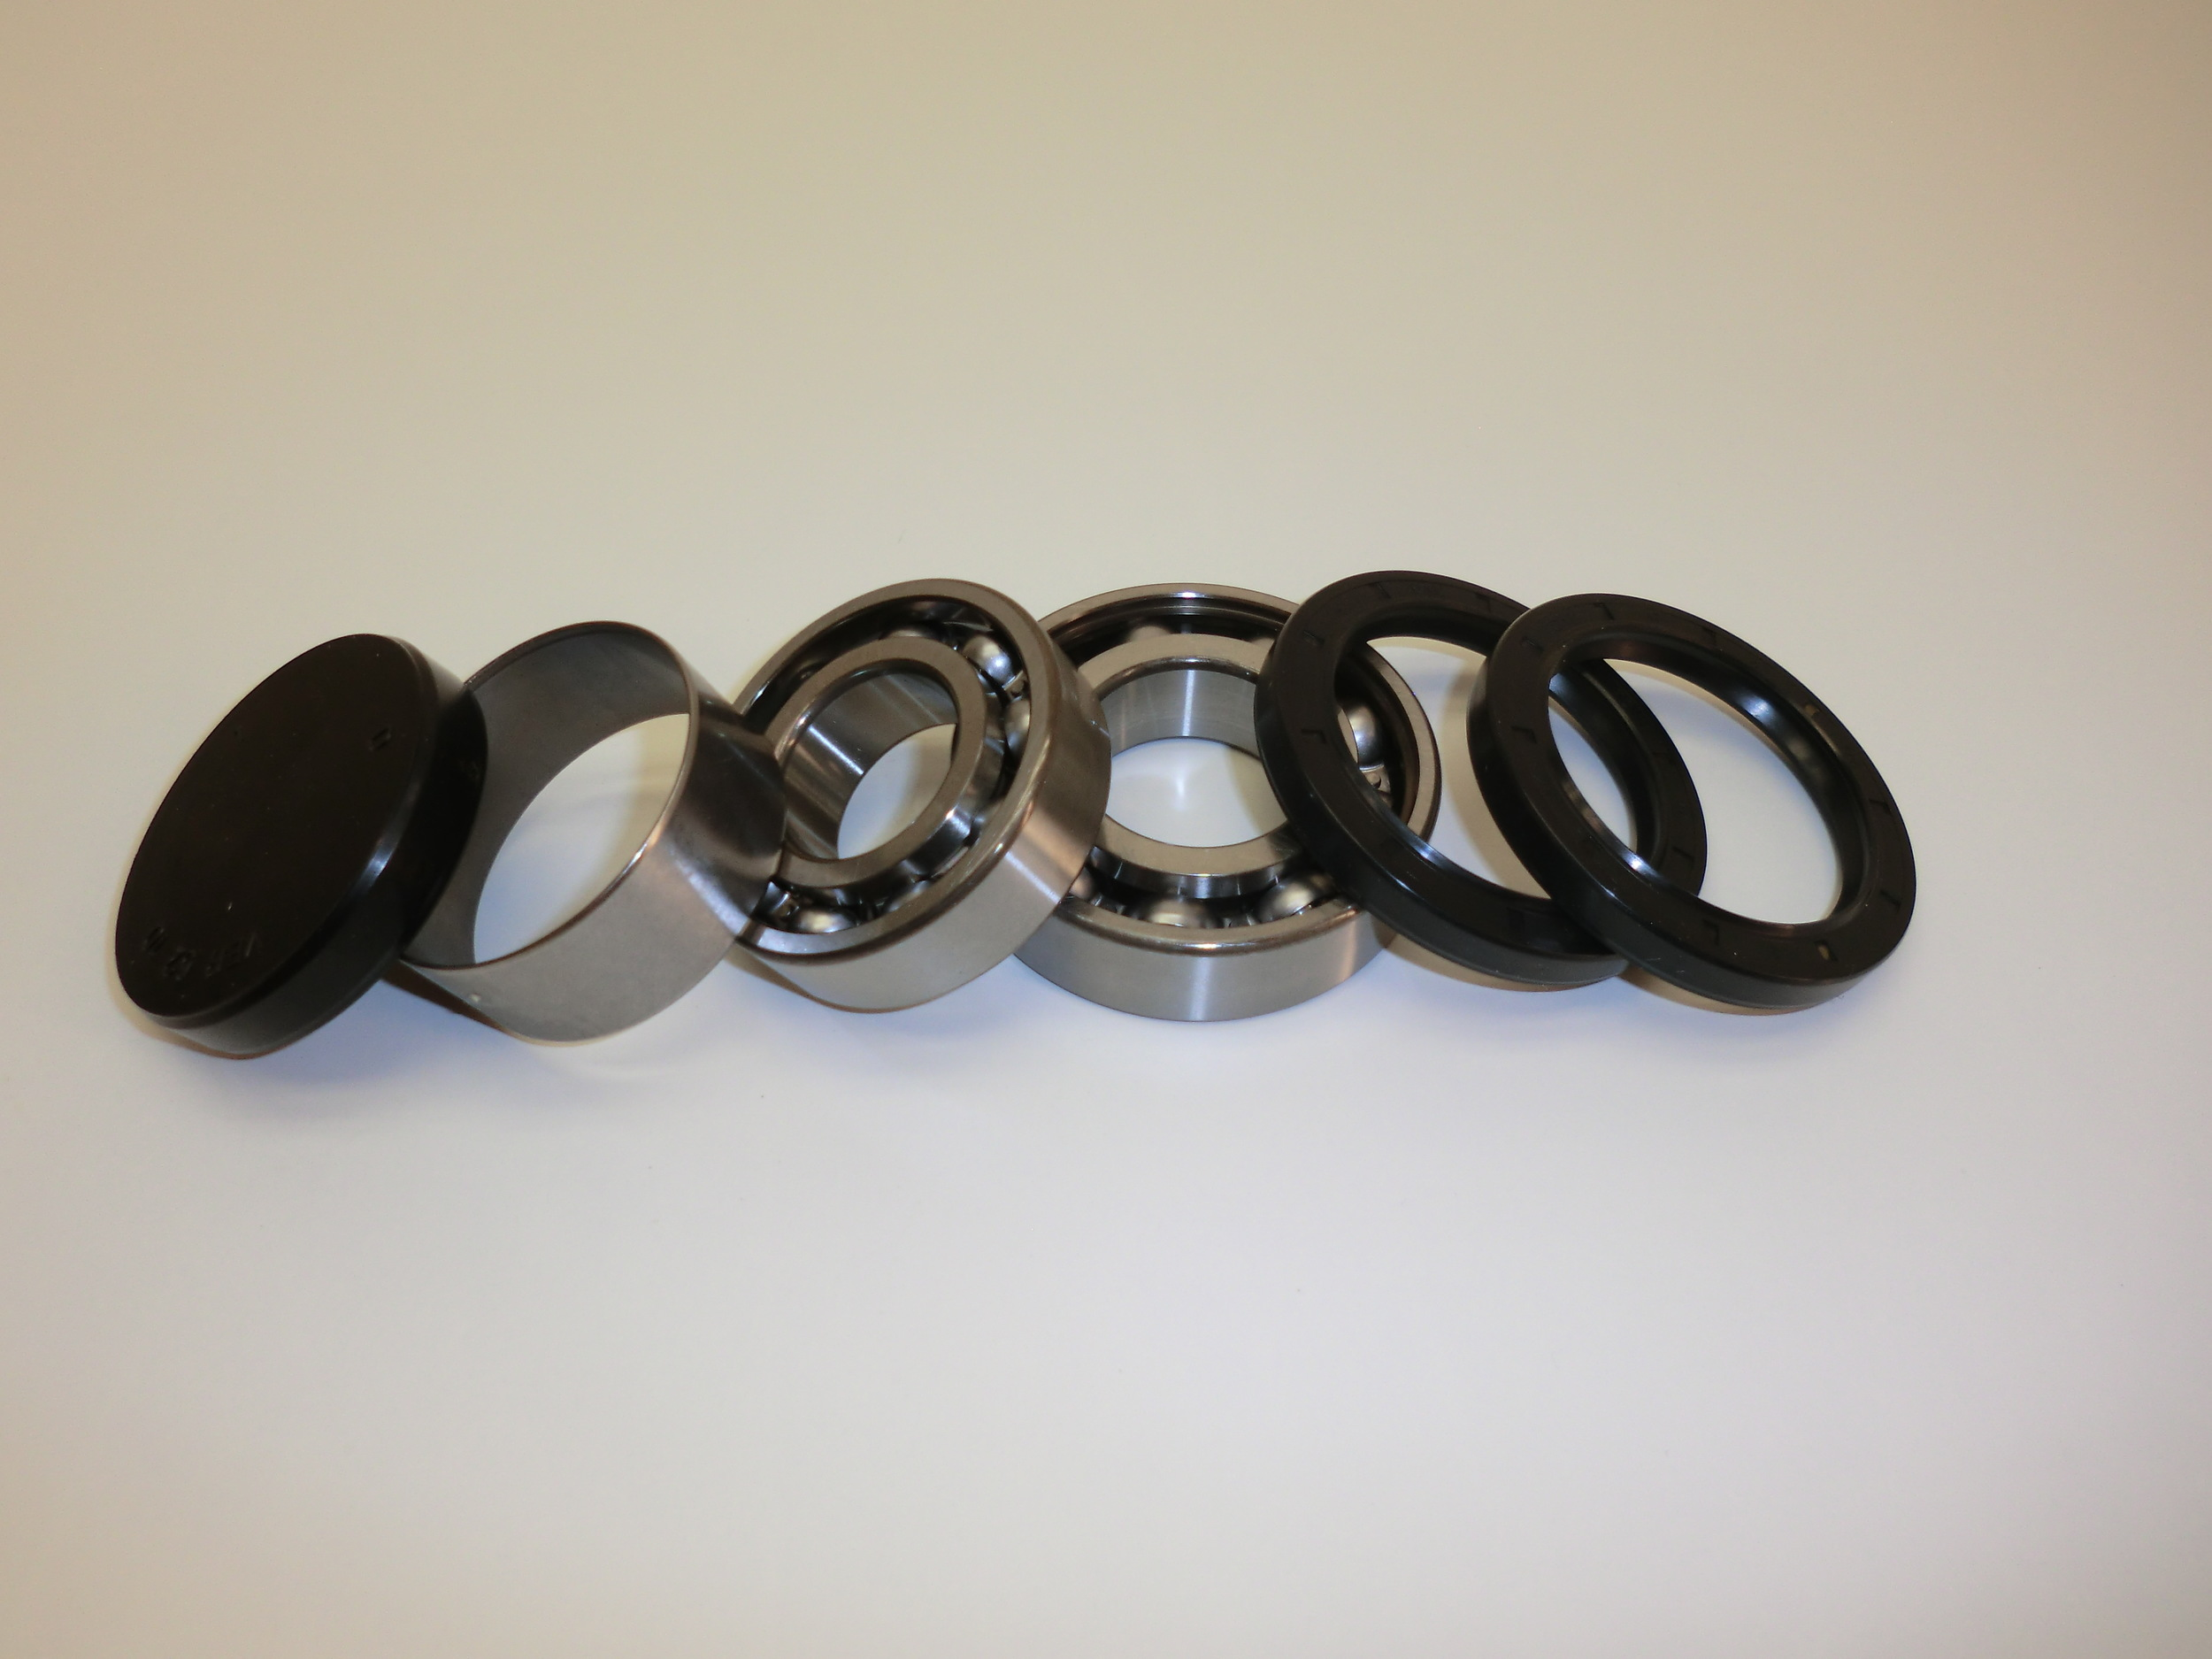 bearing kit Häggo Nr: 353 6126-802   price: 440 sek